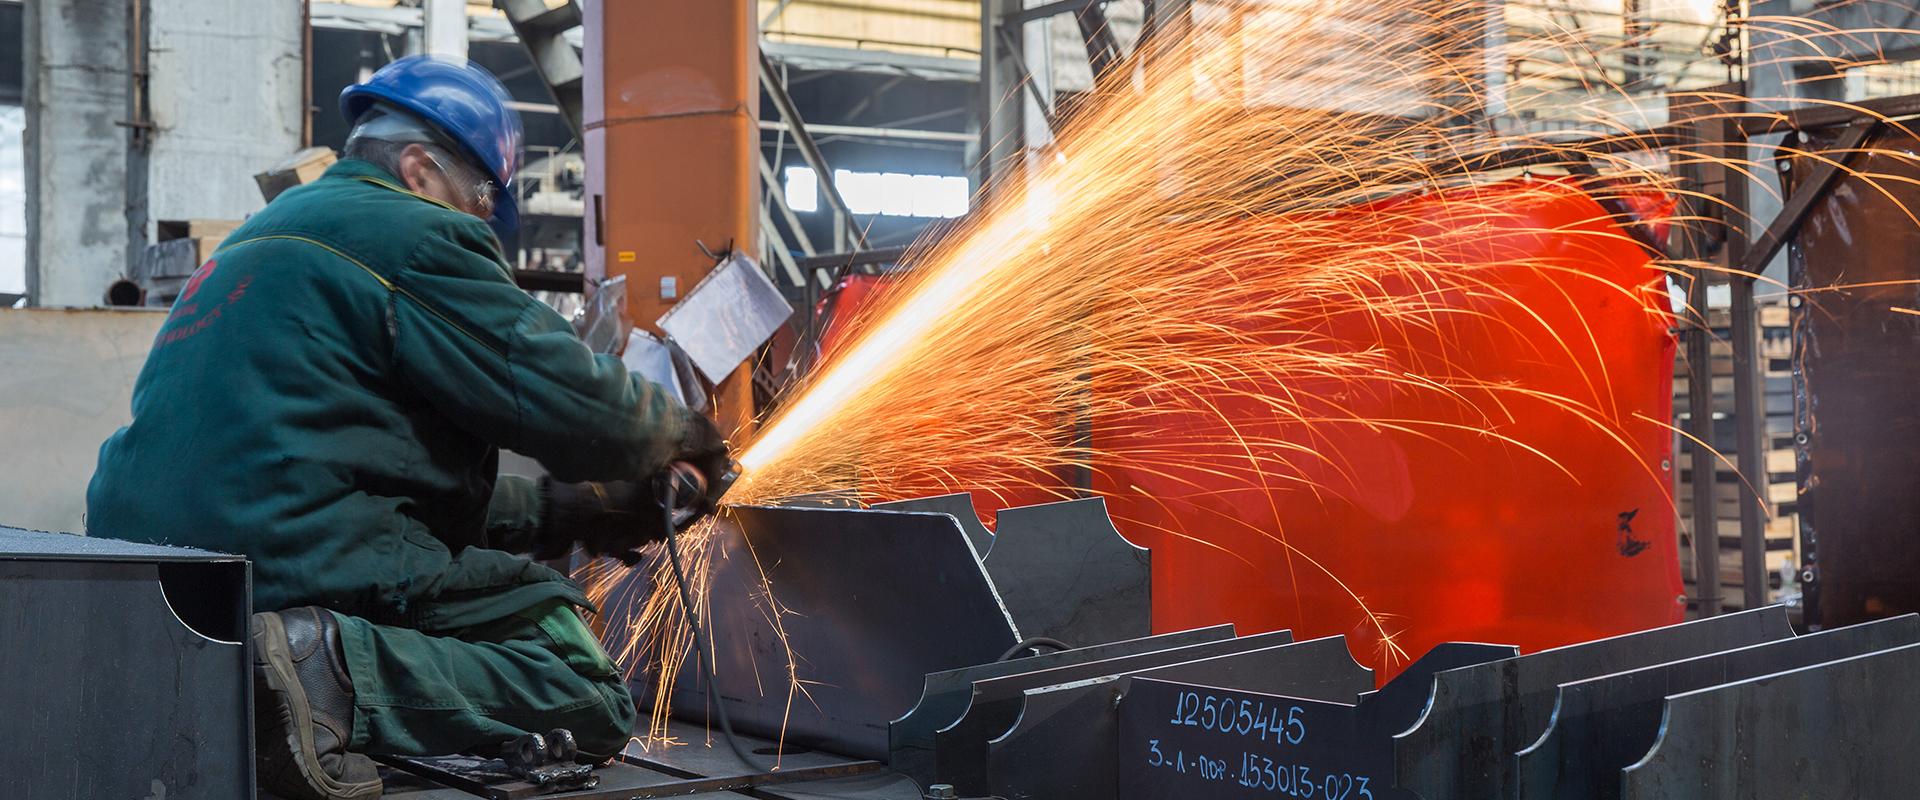 Machining large metal construction